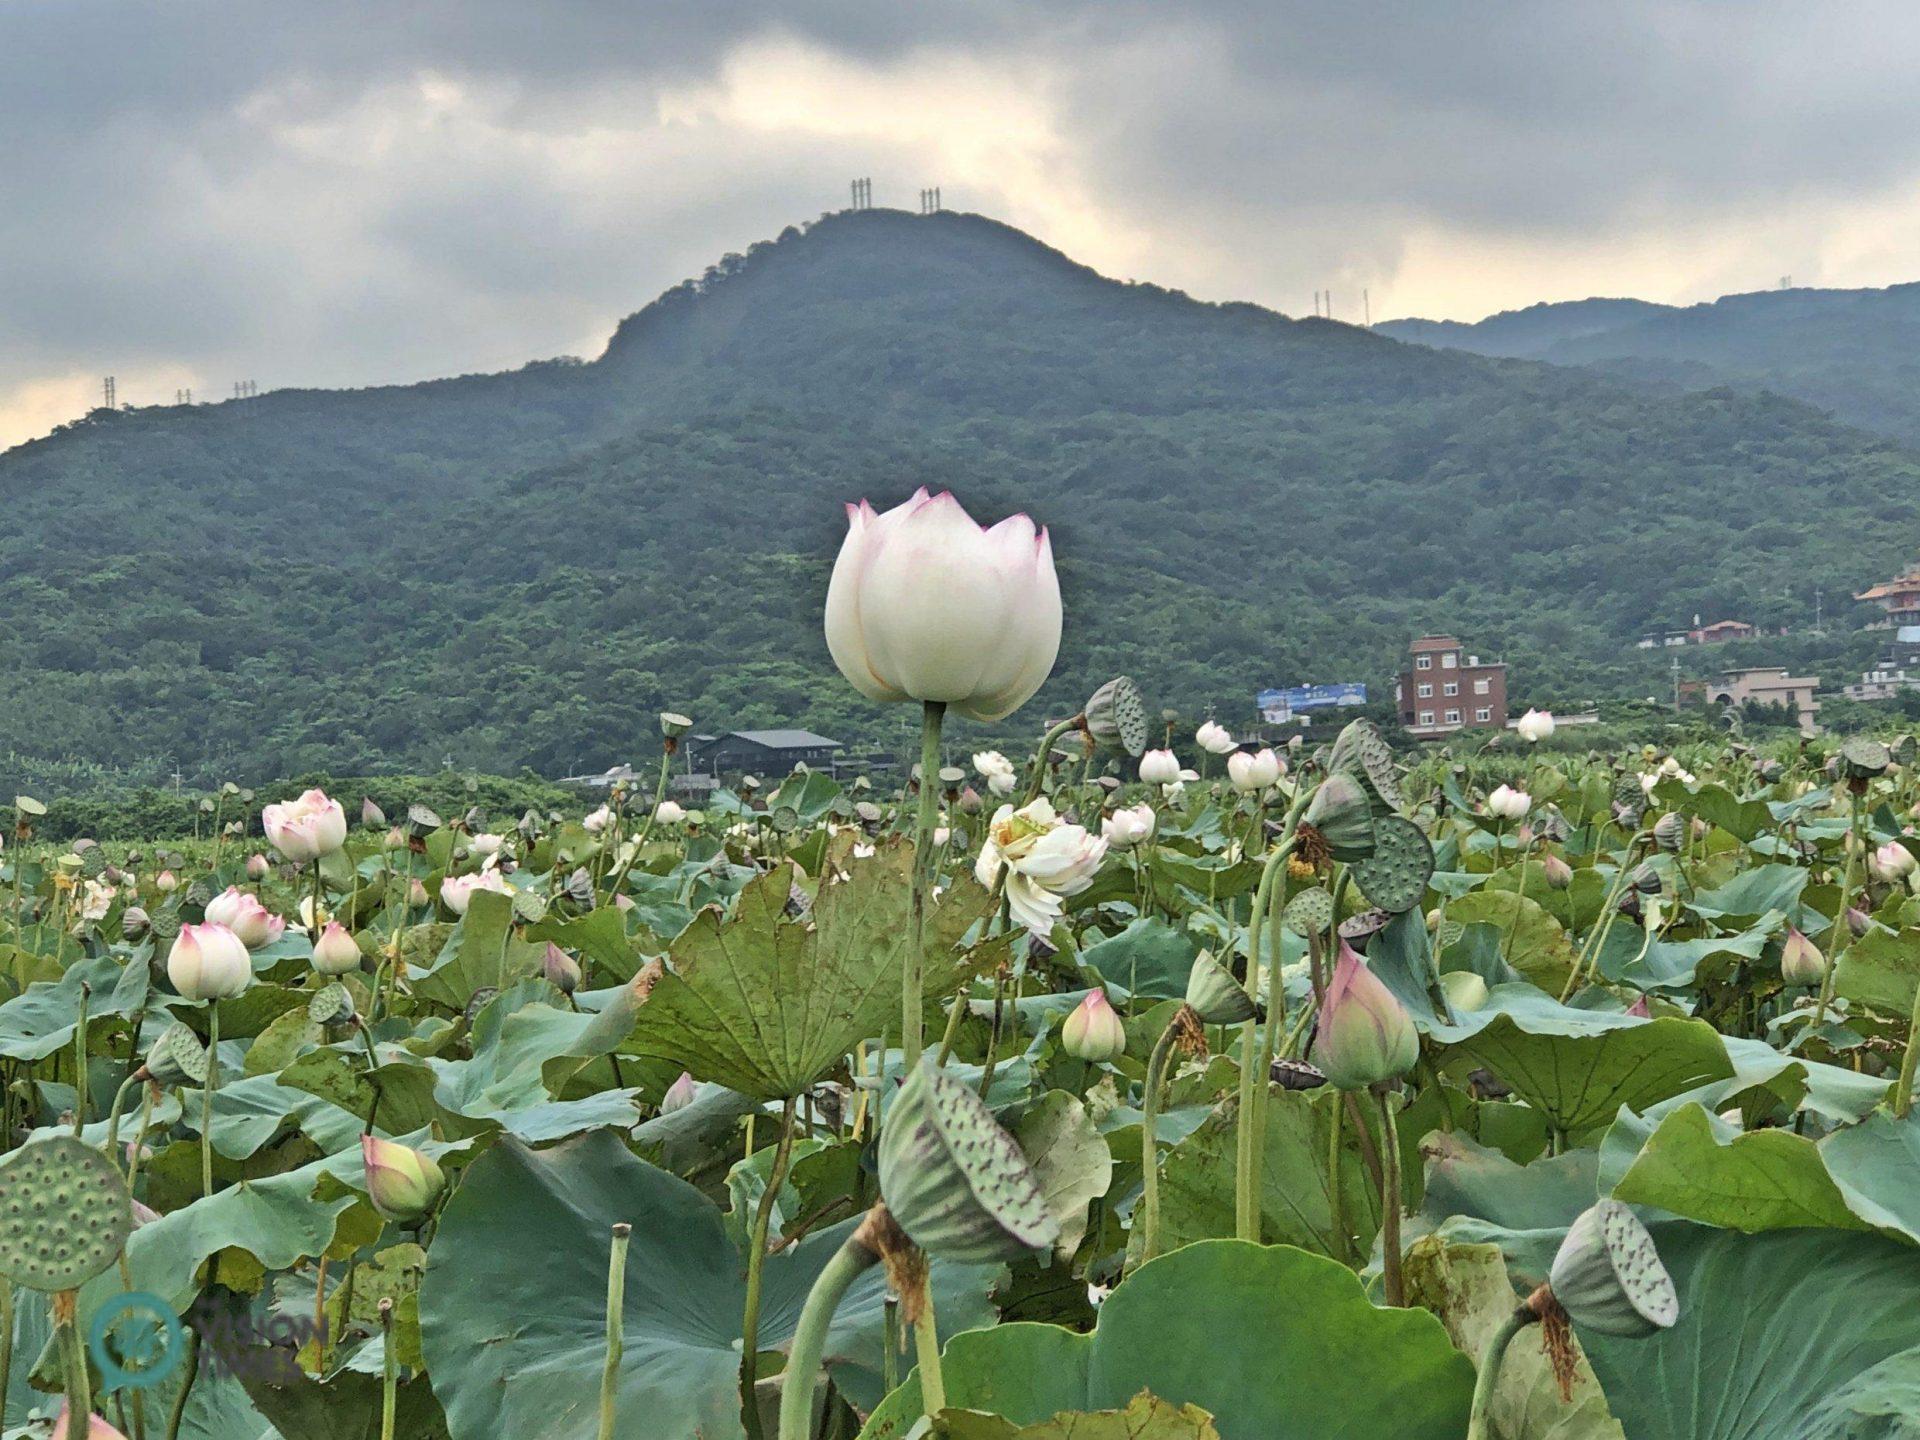 Peony lotus blooms in Qingshui Wetland in Jinshan ifrom June to September, (Image: Billy Shyu / Vision Times)